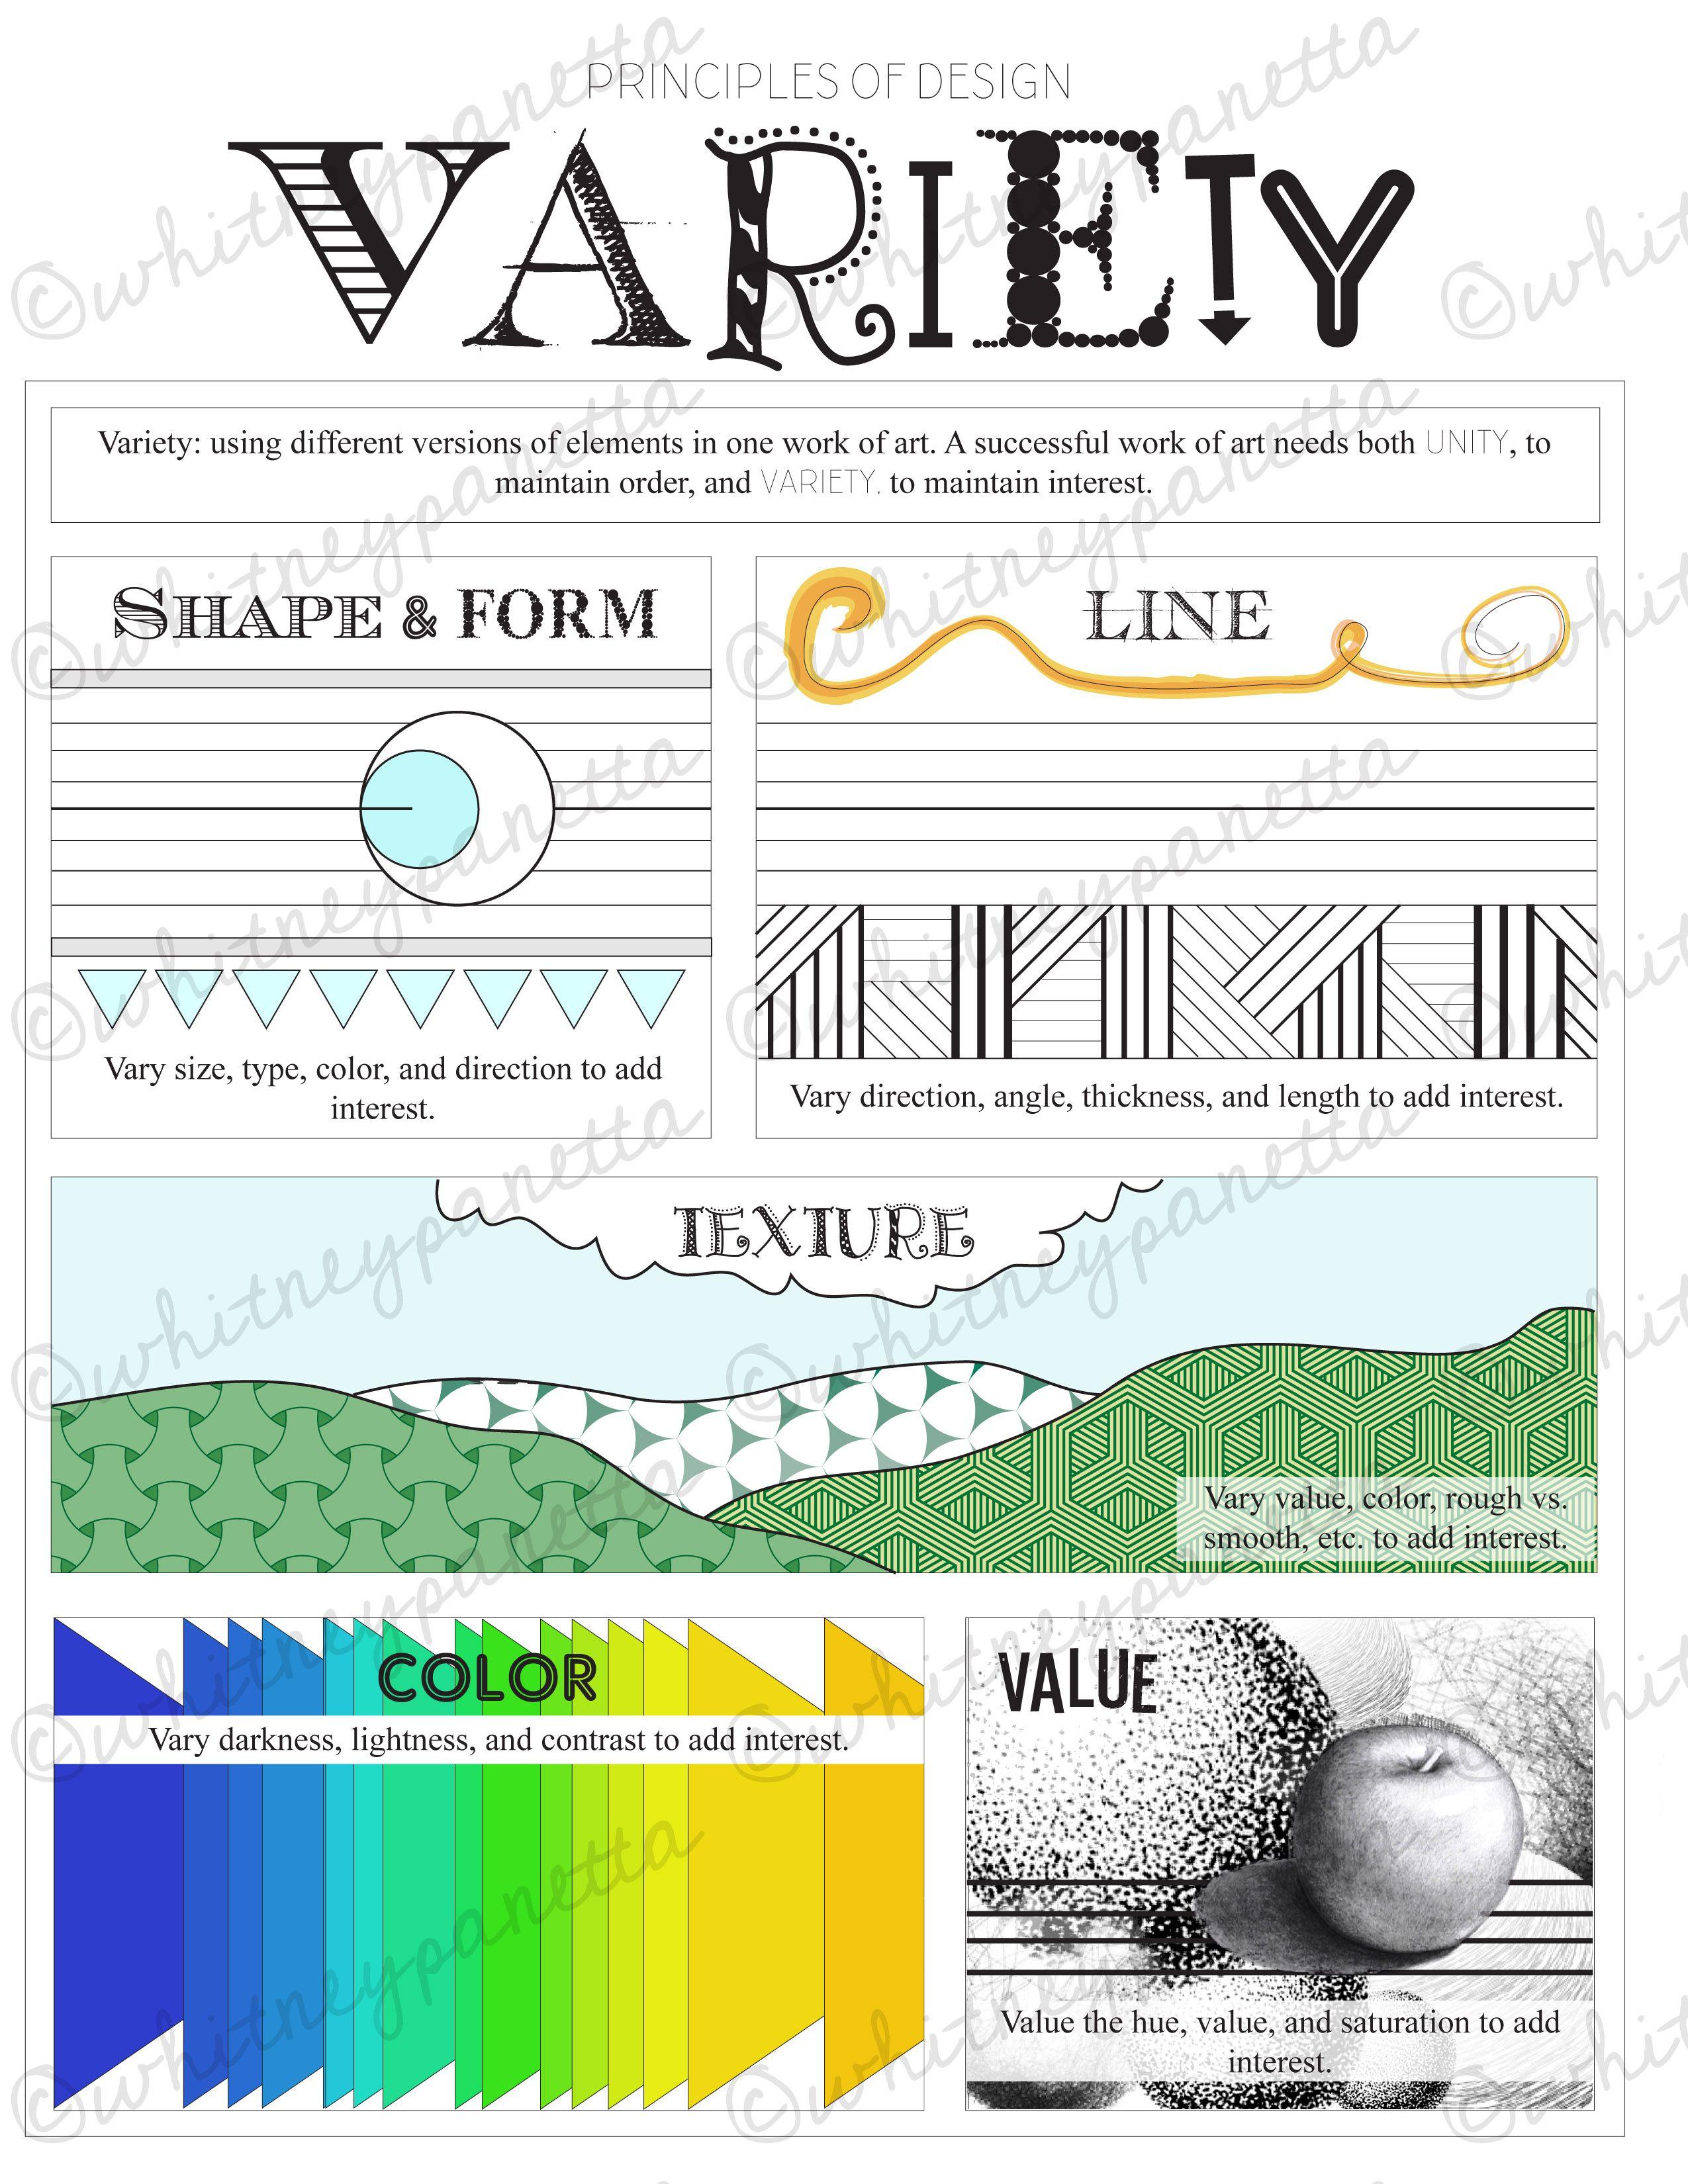 Variety Principles Of Design Printable Worksheet For Art